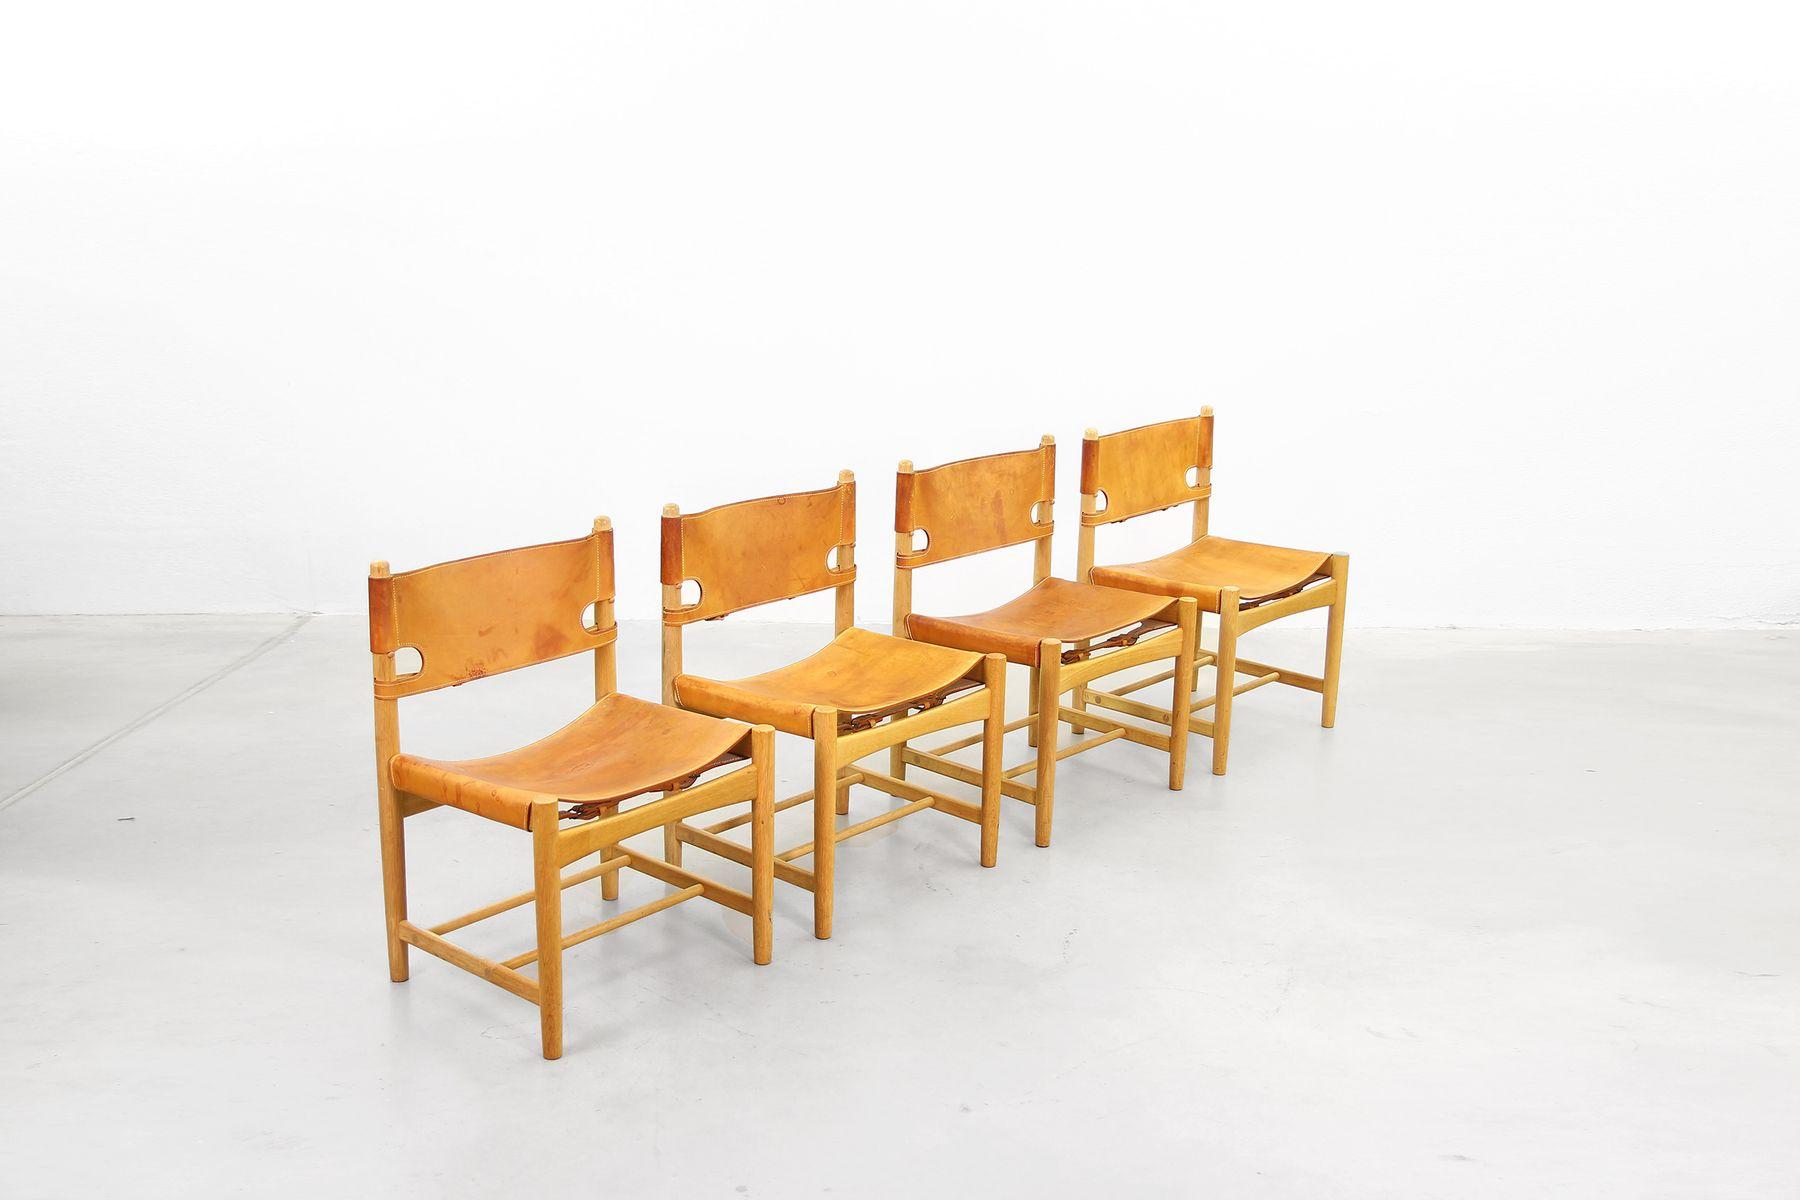 vintage 3237 esszimmer st hle von b rge mogensen f r fredericia stolefabrik 8er set bei pamono. Black Bedroom Furniture Sets. Home Design Ideas